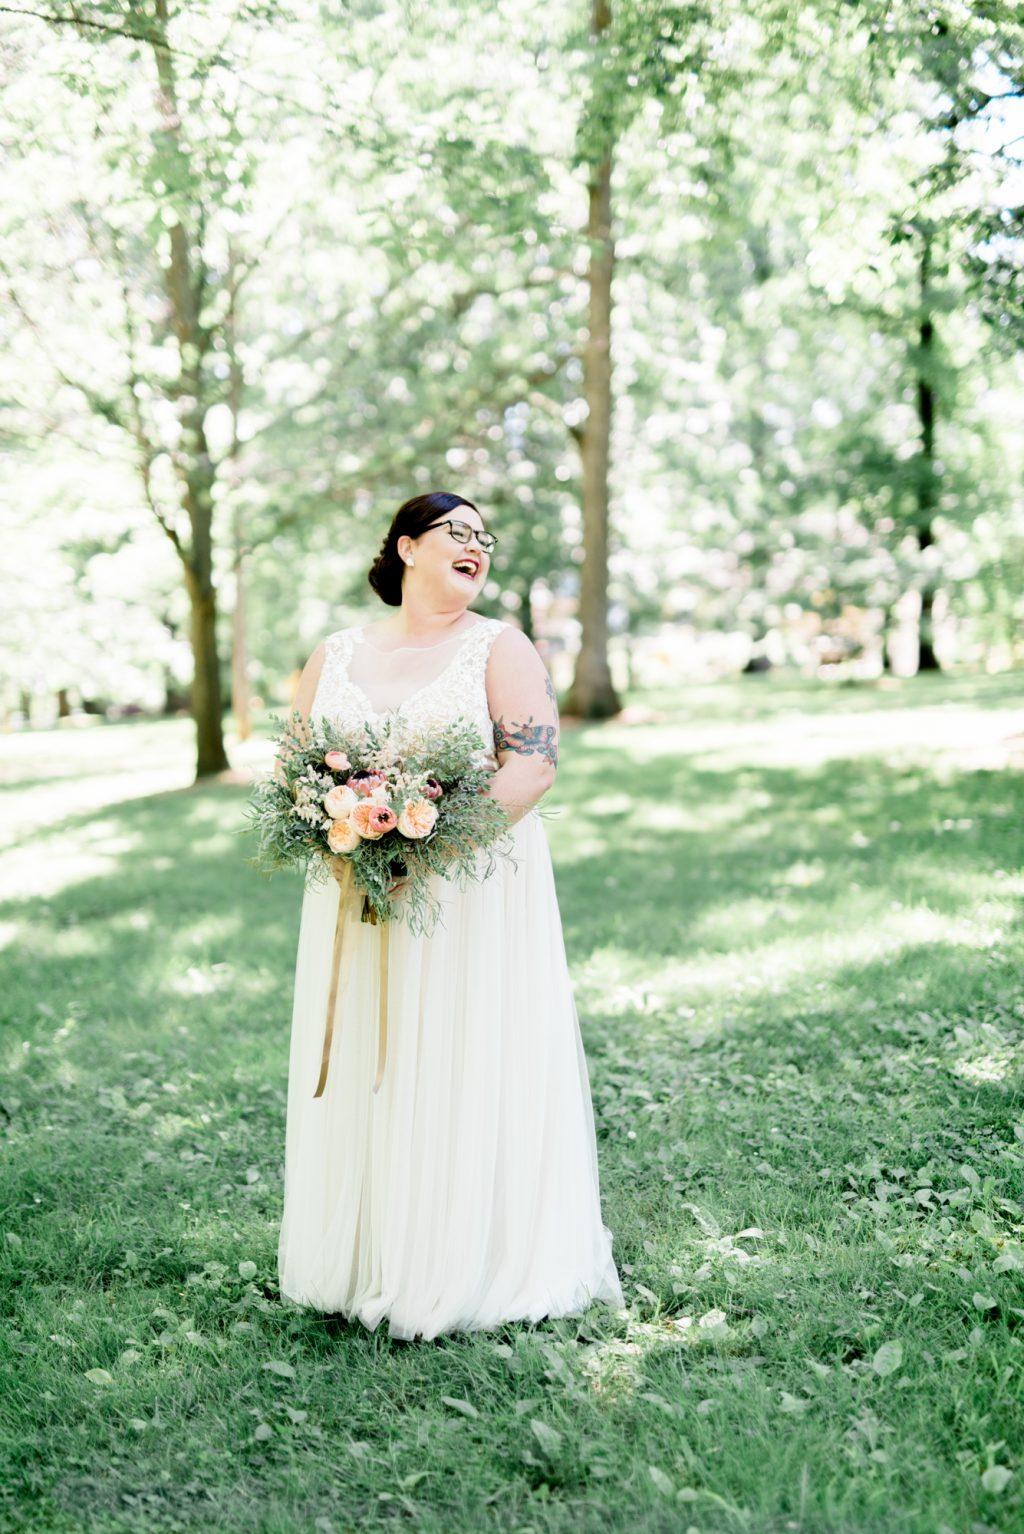 haley-richter-photo-west-chester-summer-wedding-boxcar-brewery-051